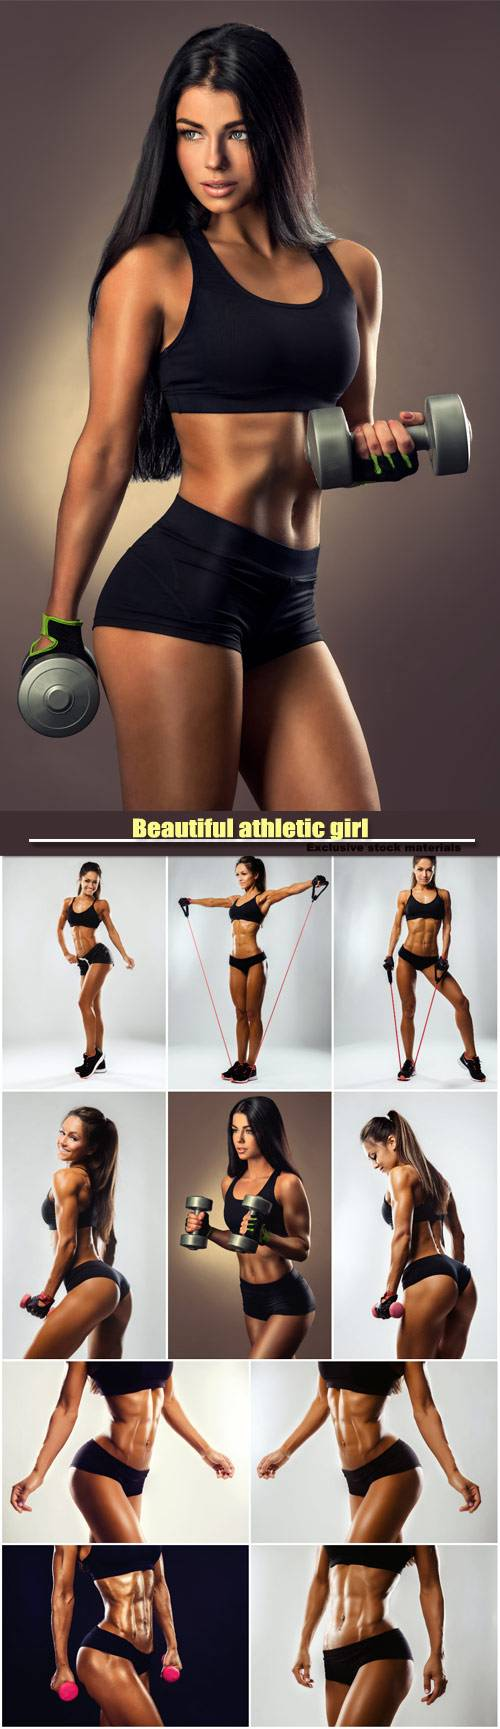 Beautiful athletic girl, exercise